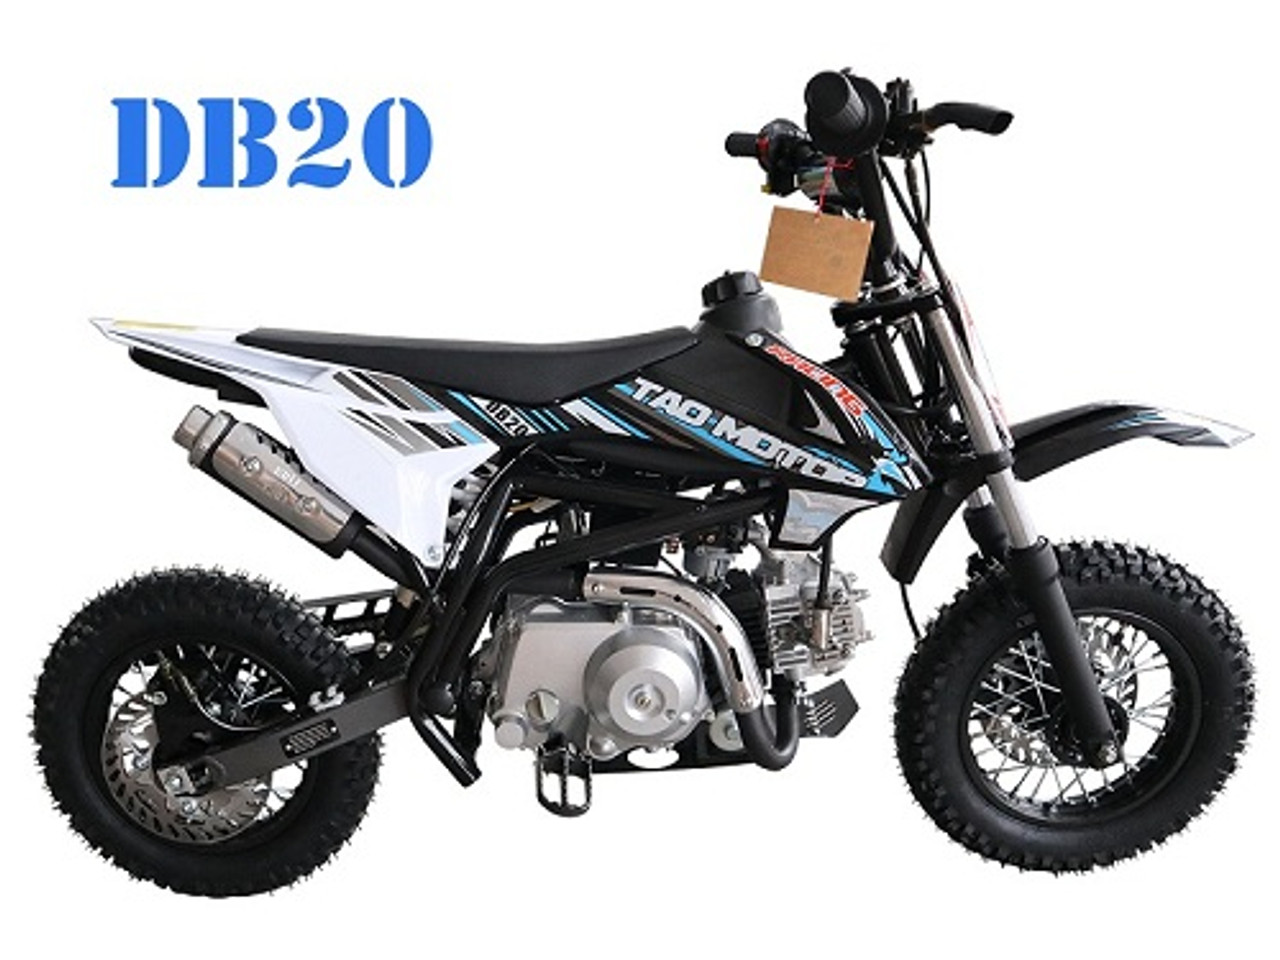 TaoTao DB20 107CC, Air cooled, 4-Stroke, Single-Cylinder, Automatic